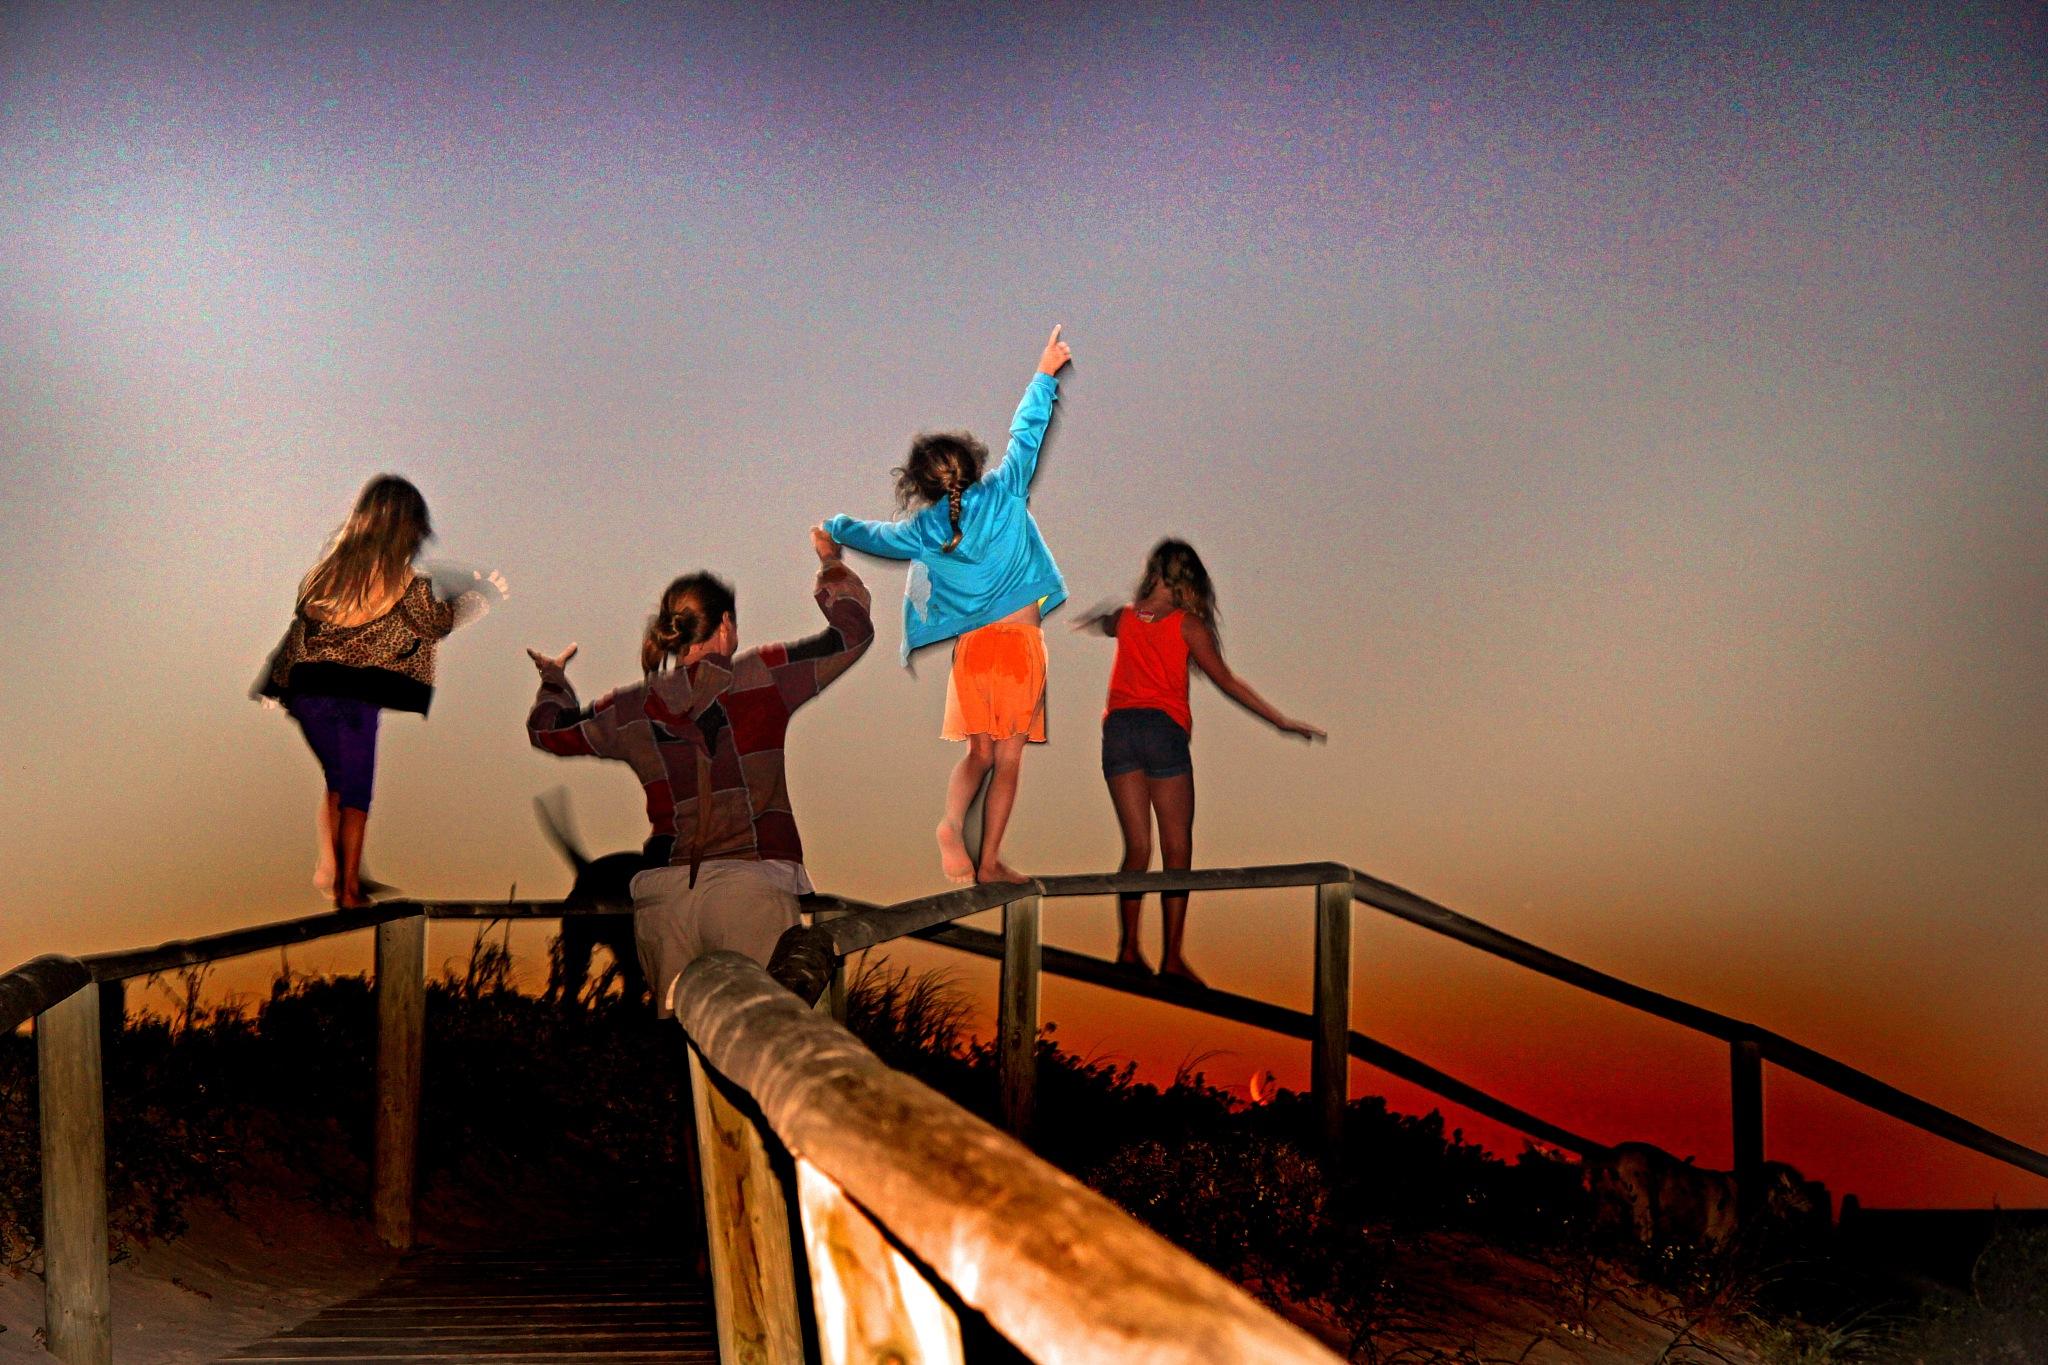 Fun on the boardwalk by Nauta Piscatorque